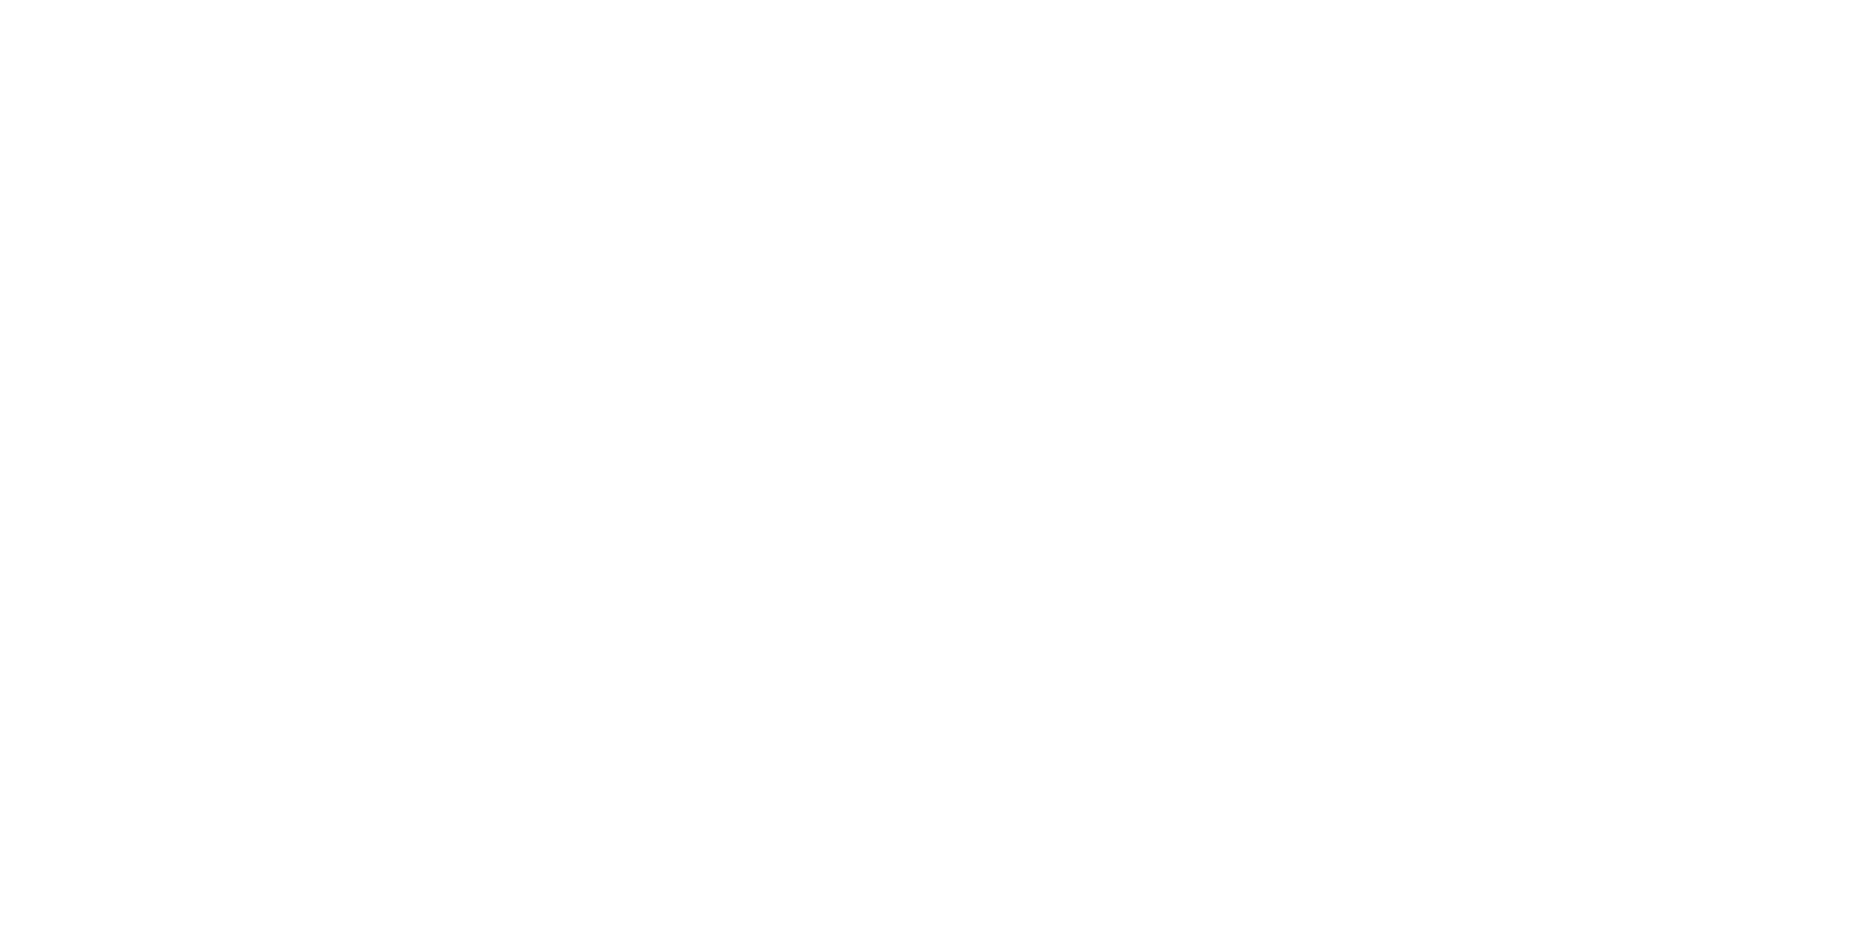 logo-design-8